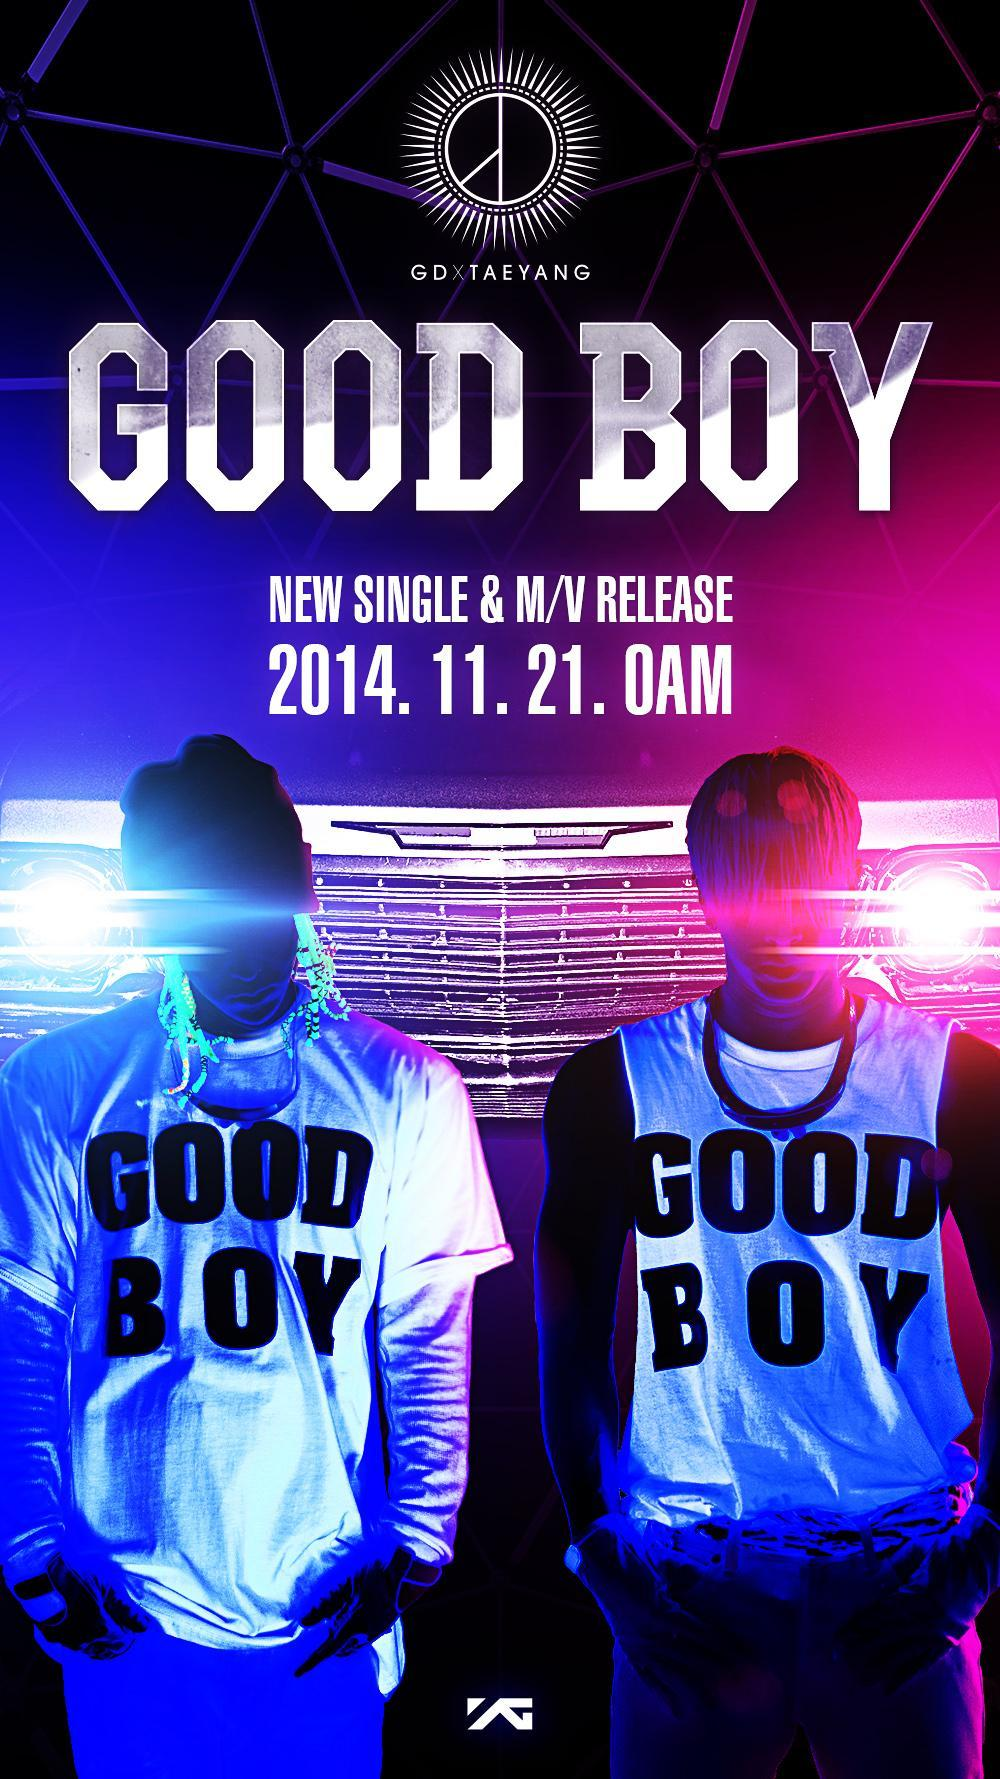 GD x Taeyang collab teaser